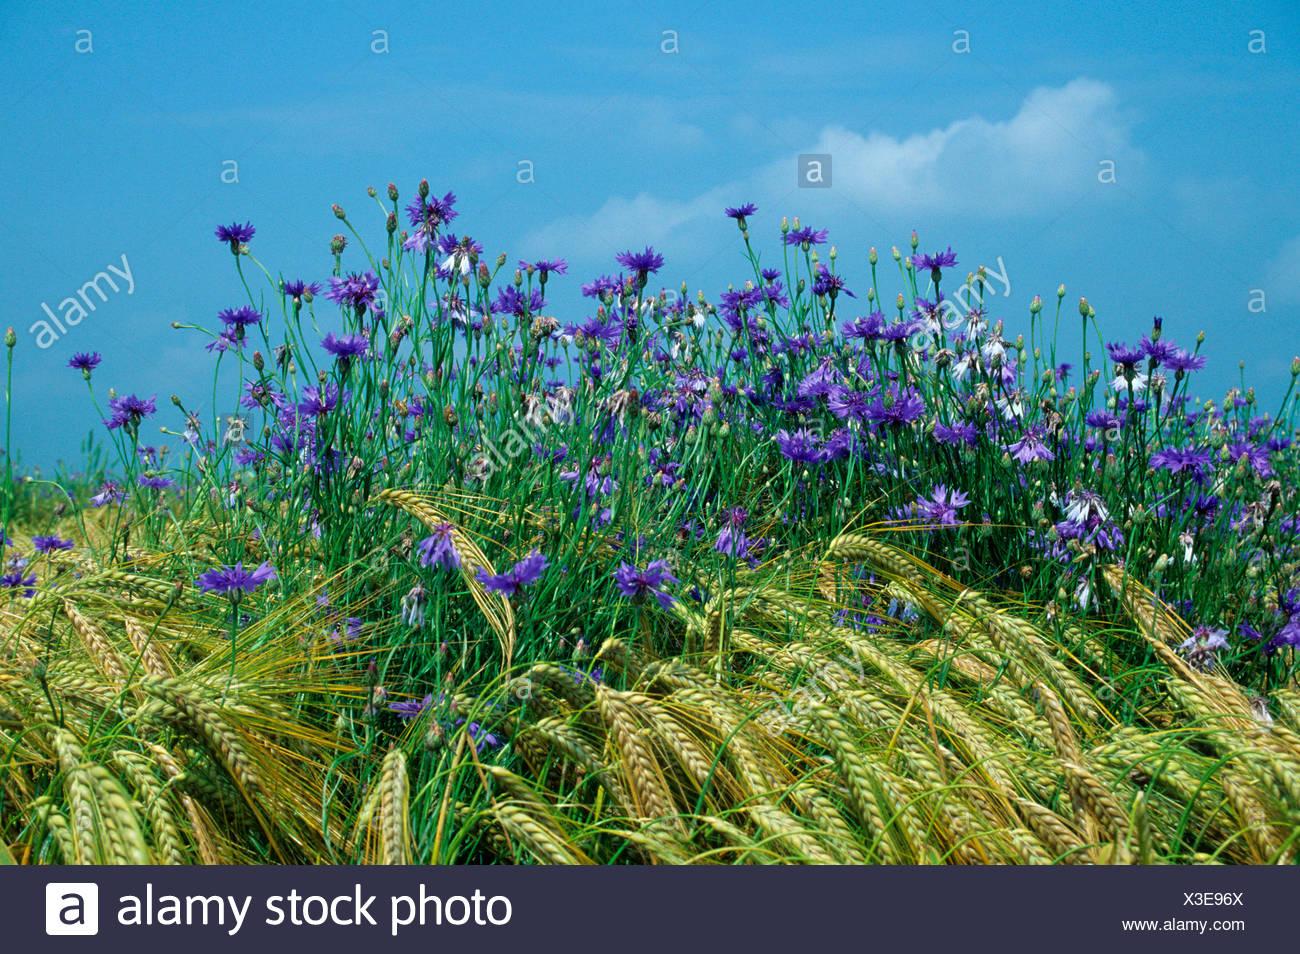 Cornflowers (Centaurea cyanus) in a barley field, Allgaeu, Germany, Europe - Stock Image